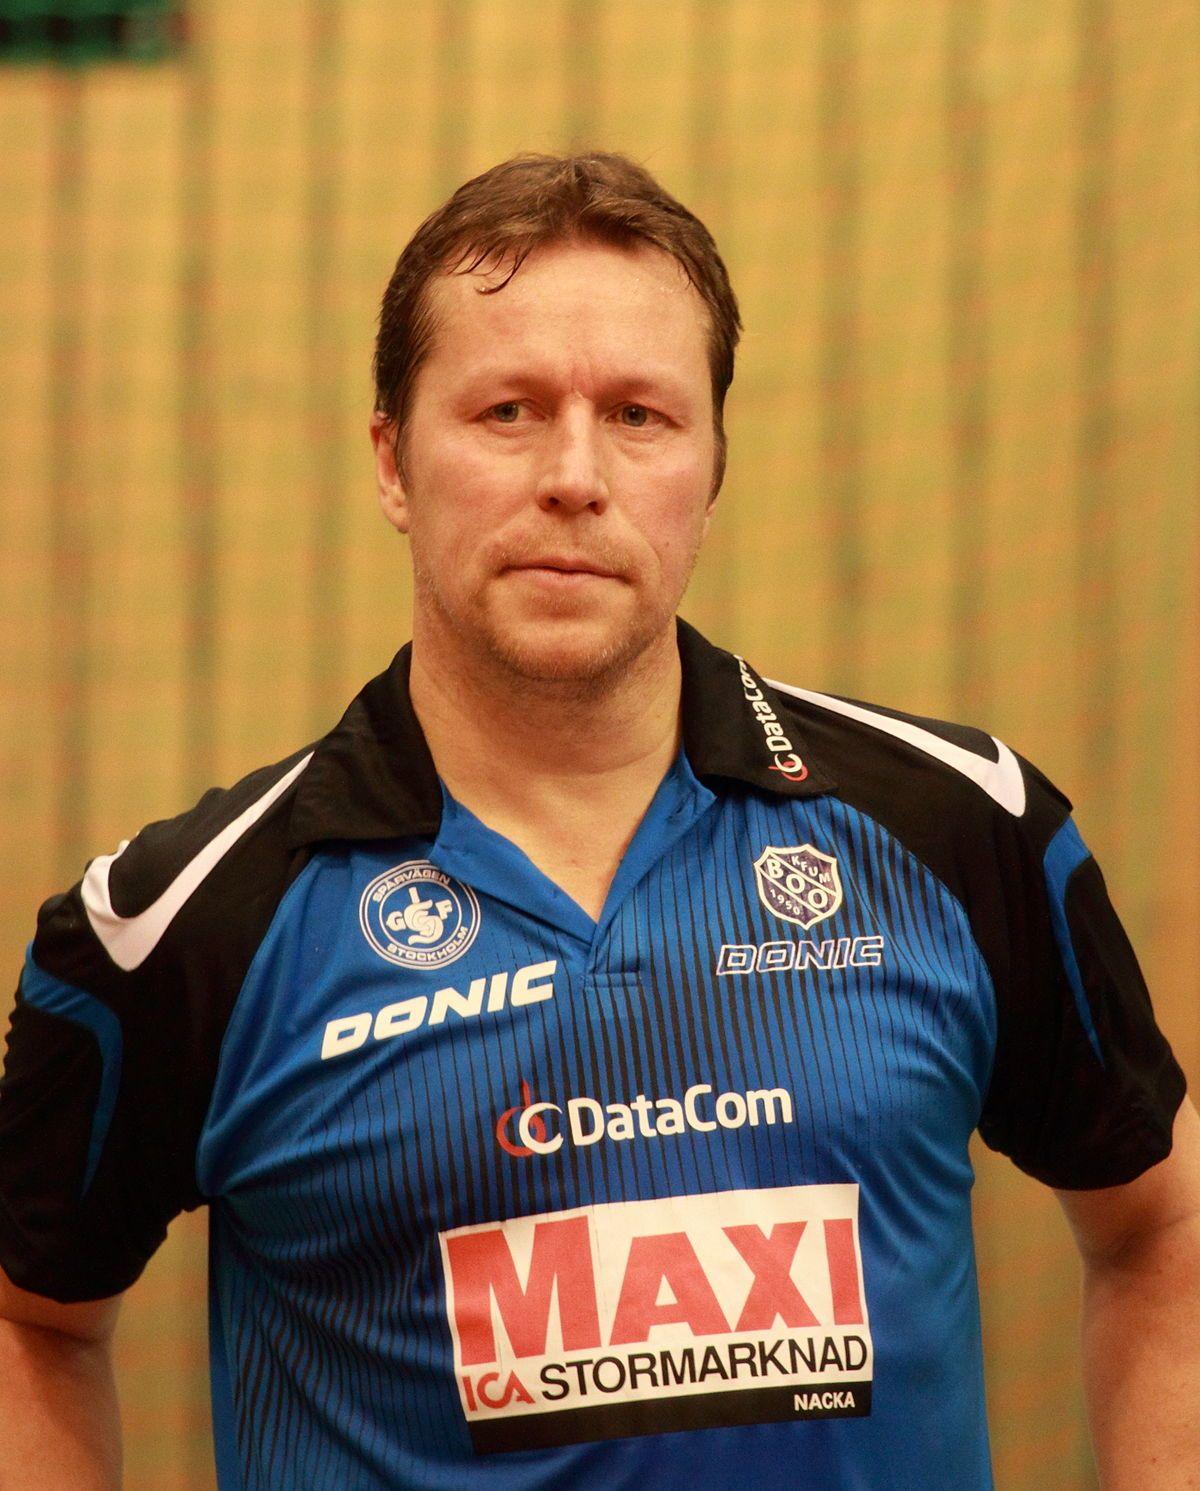 Jan Waldner Table WikipediaSports Stars Tennis Ove Player qMSUVzp